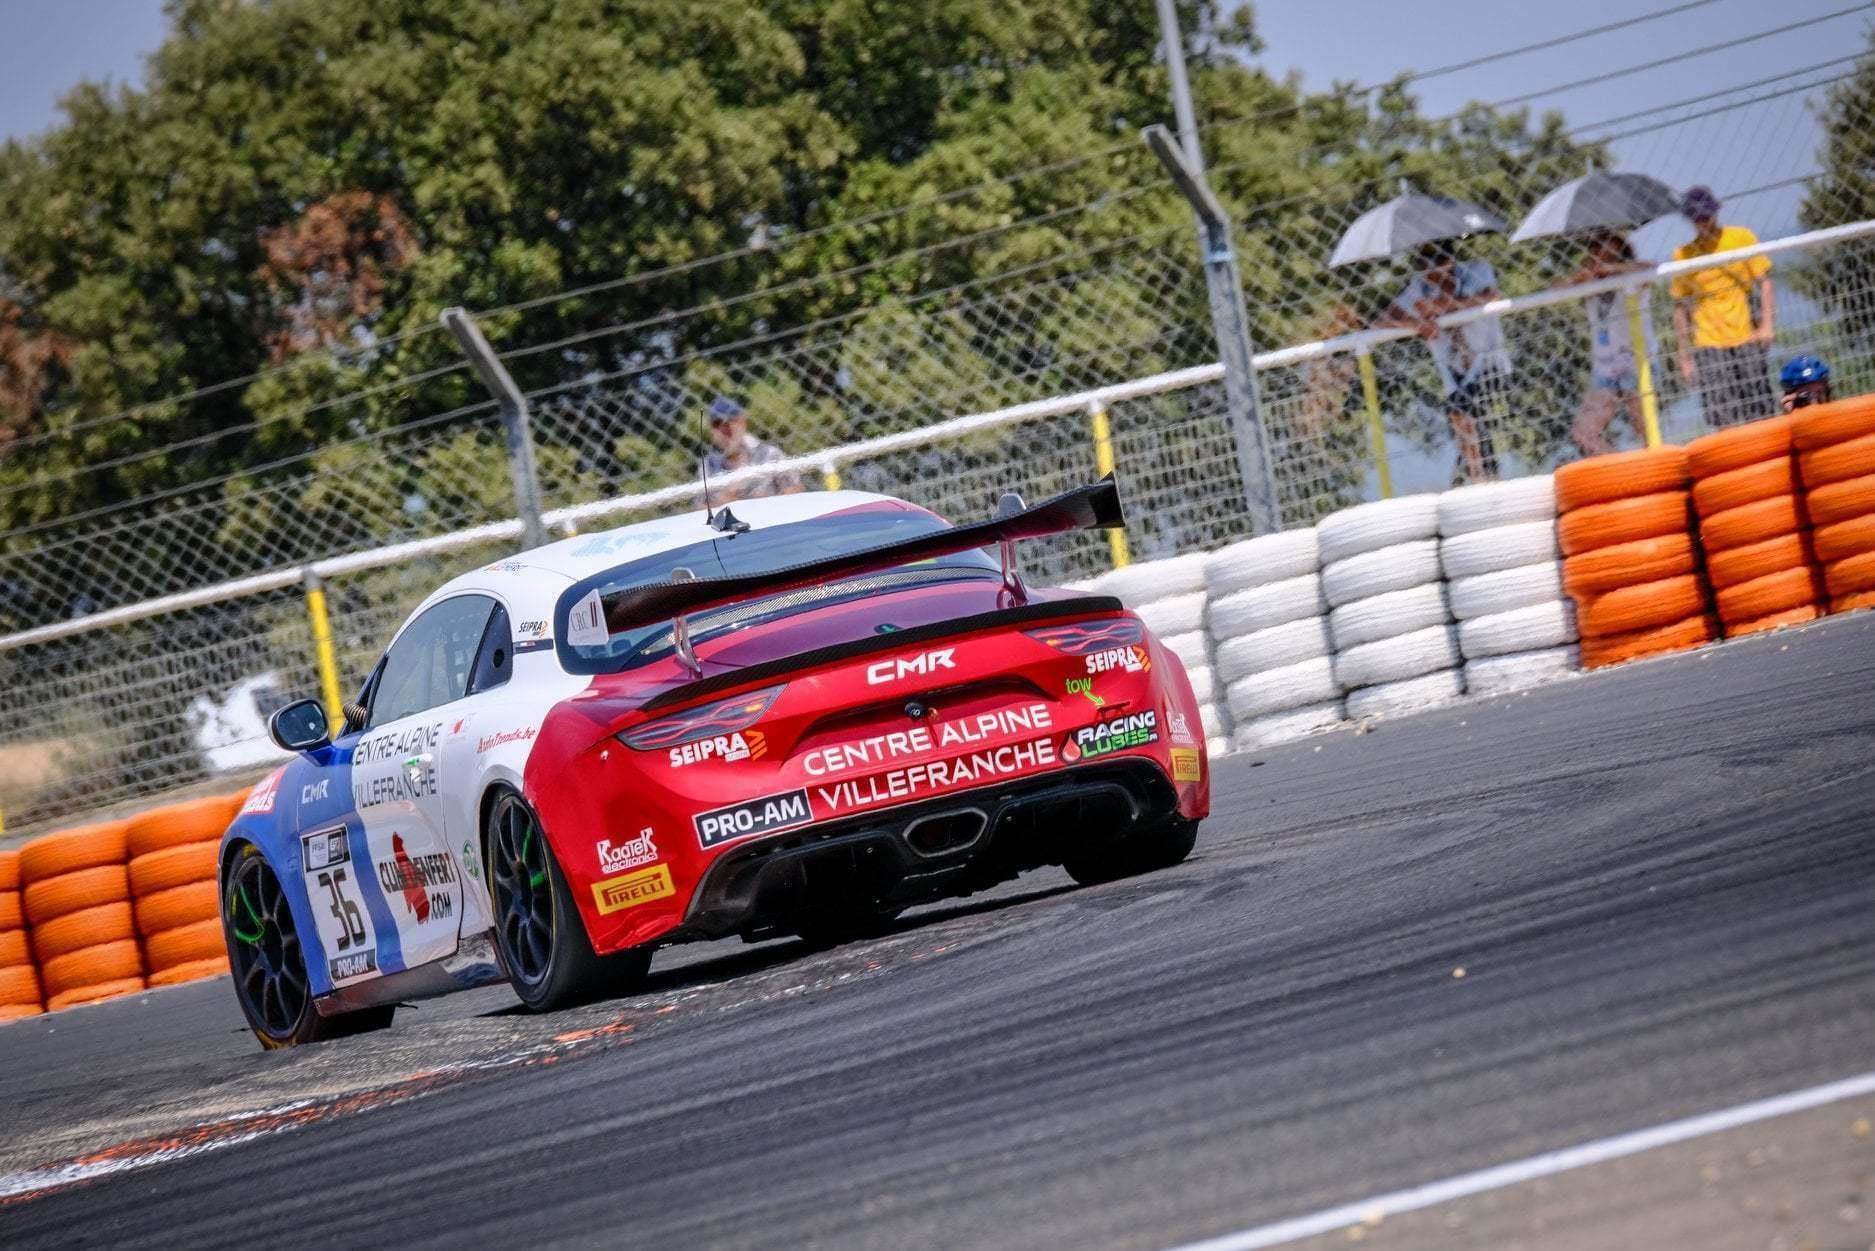 FFSA GT: CMR reprend la main Lédenon ! (Course 2) 14